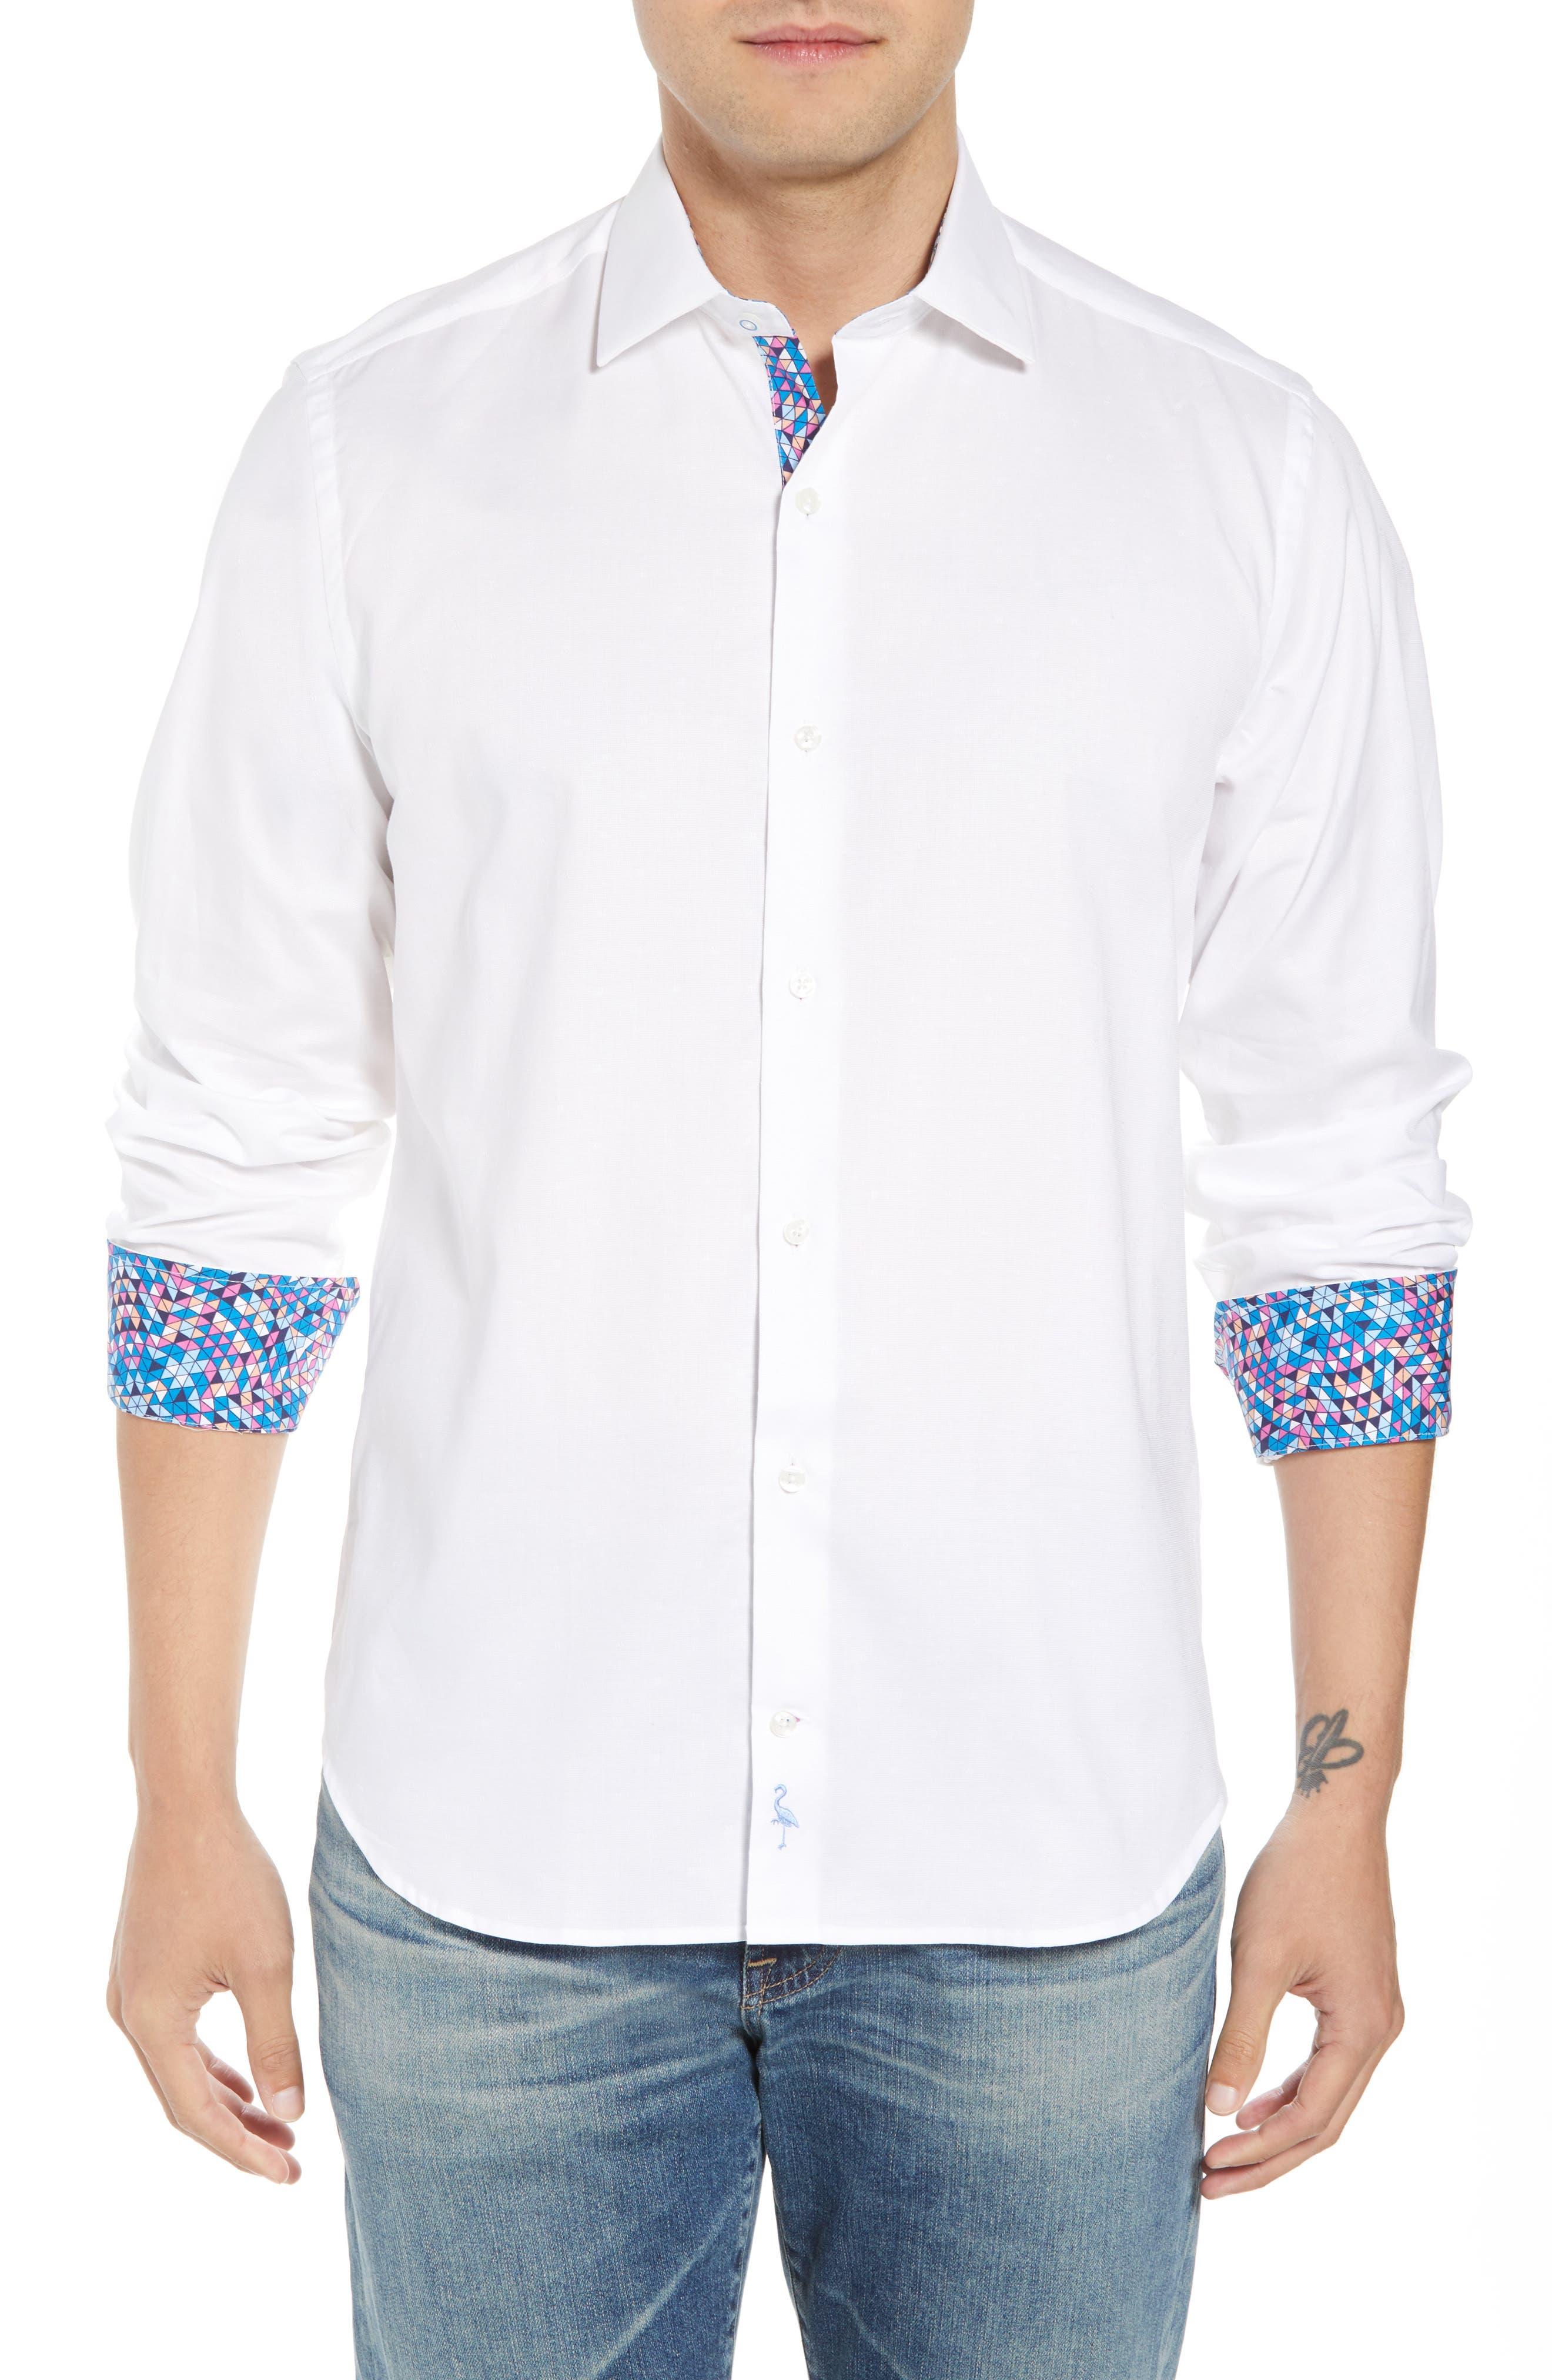 Baxley Regular Fit Sport Shirt,                         Main,                         color,